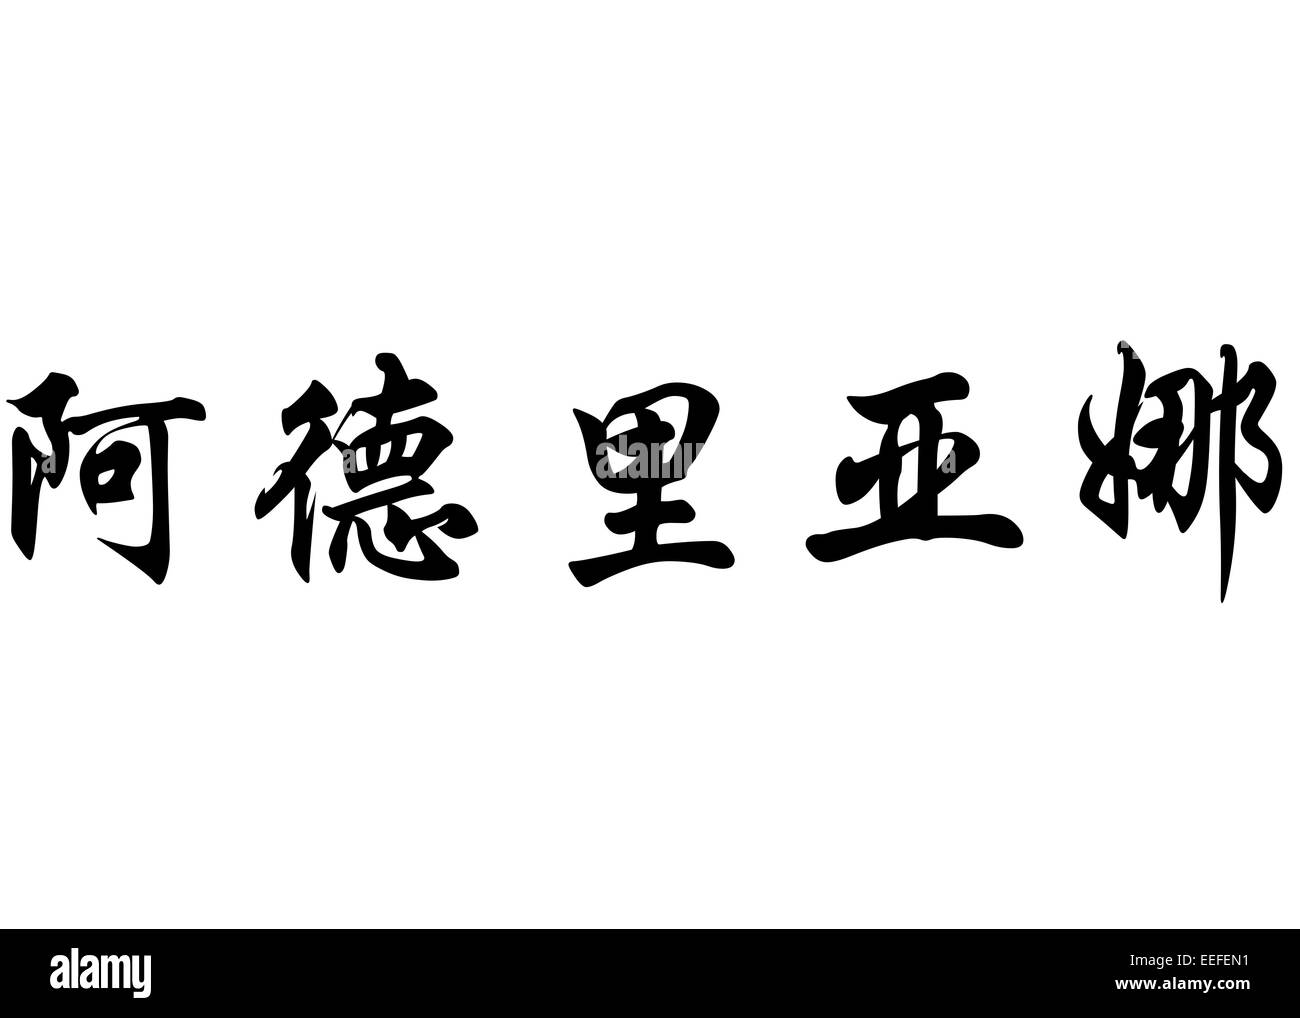 English name adriana in chinese kanji calligraphy characters or english name adriana in chinese kanji calligraphy characters or japanese characters biocorpaavc Choice Image